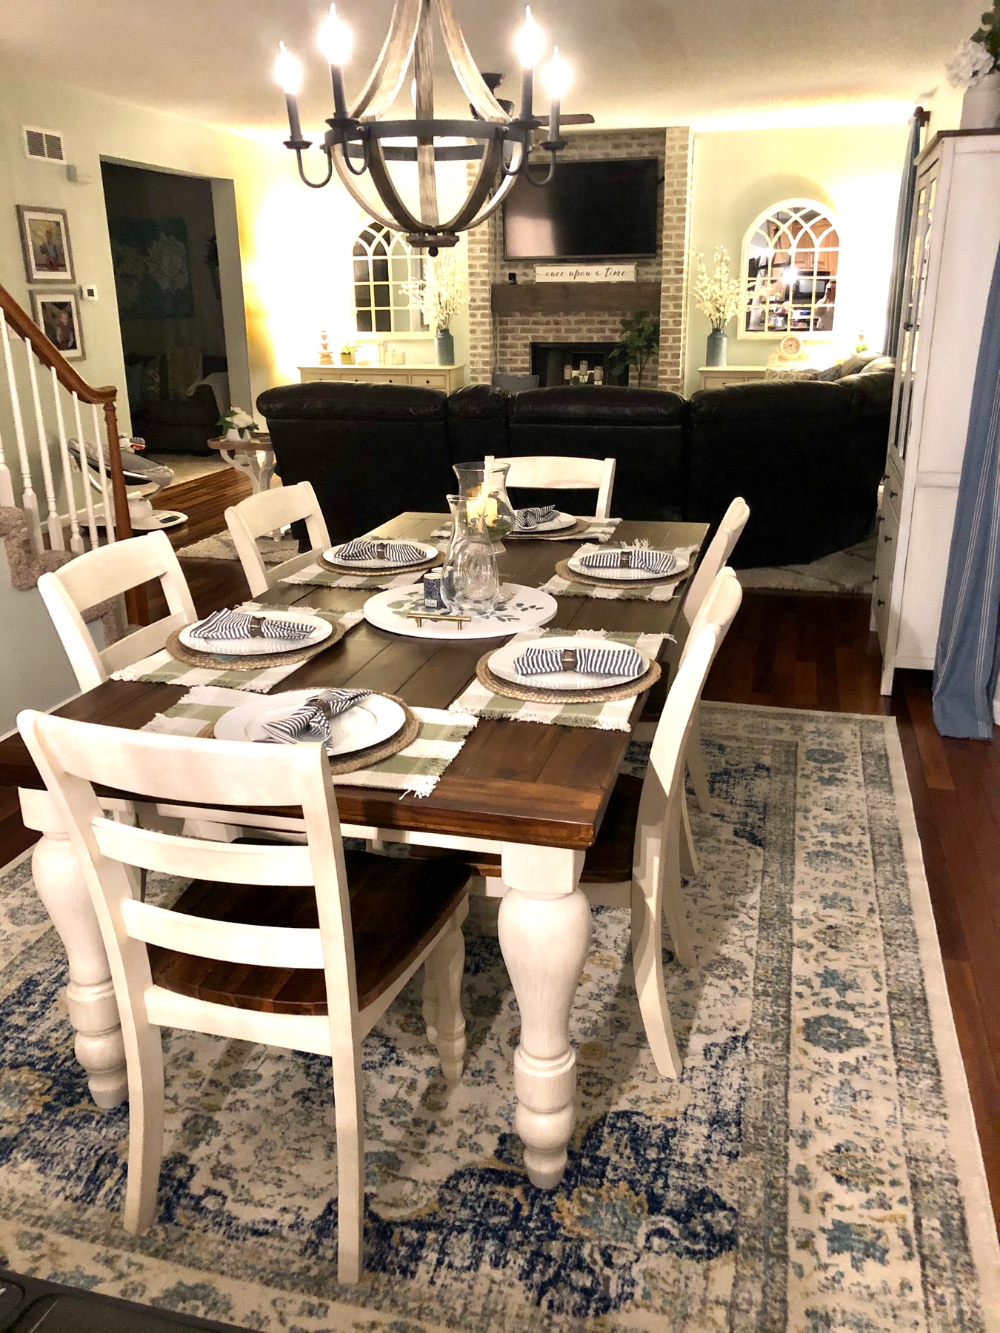 Rustic Dining Room Table, Marsilona Dining Room Table